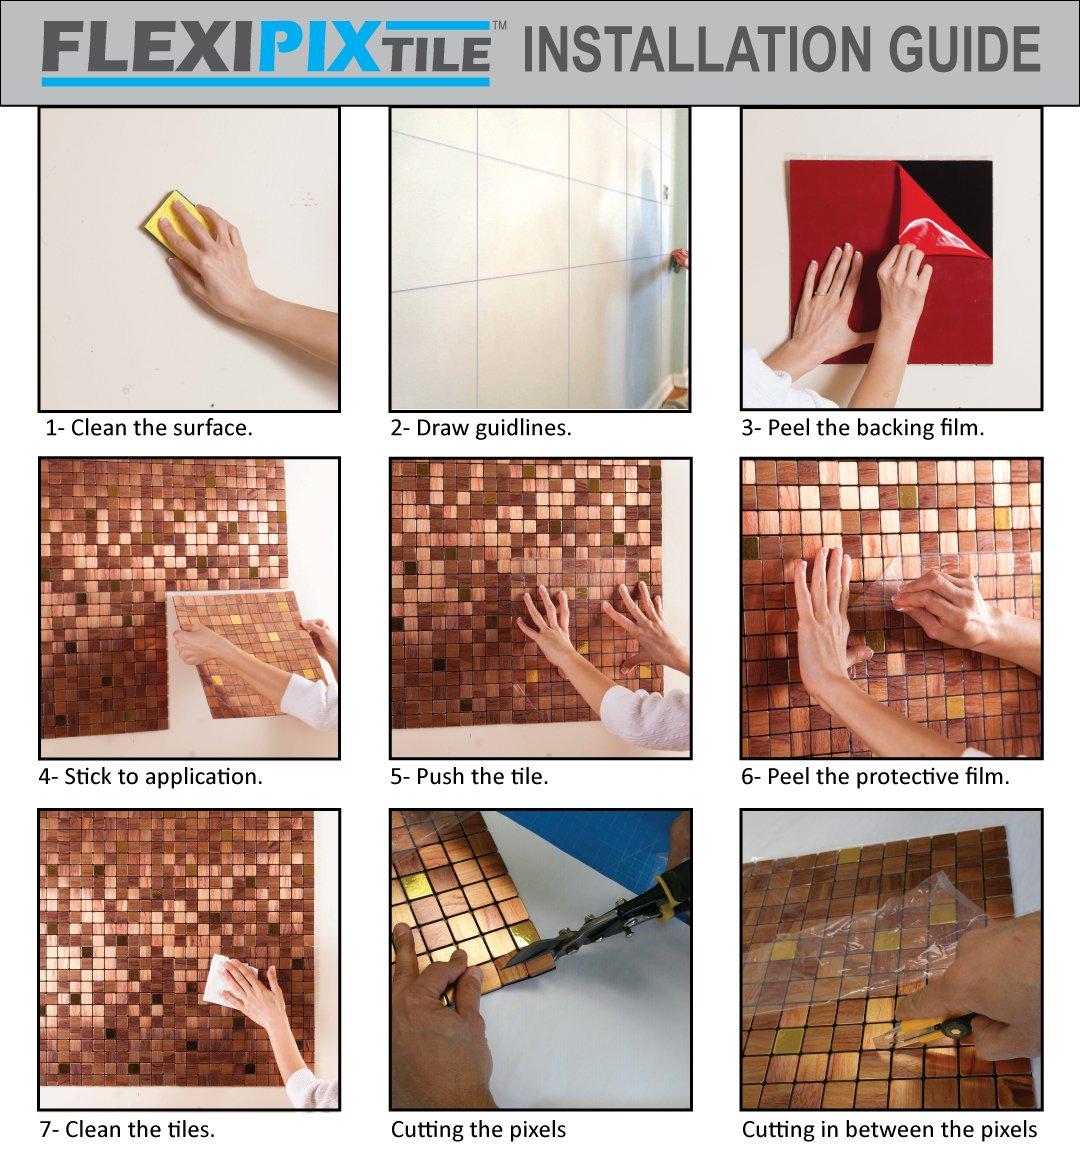 amazon com flexipixtile modern aluminum mosaic tile peel amazon com flexipixtile modern aluminum mosaic tile peel stick backsplash accent wall 1 sq ft red velvet home kitchen